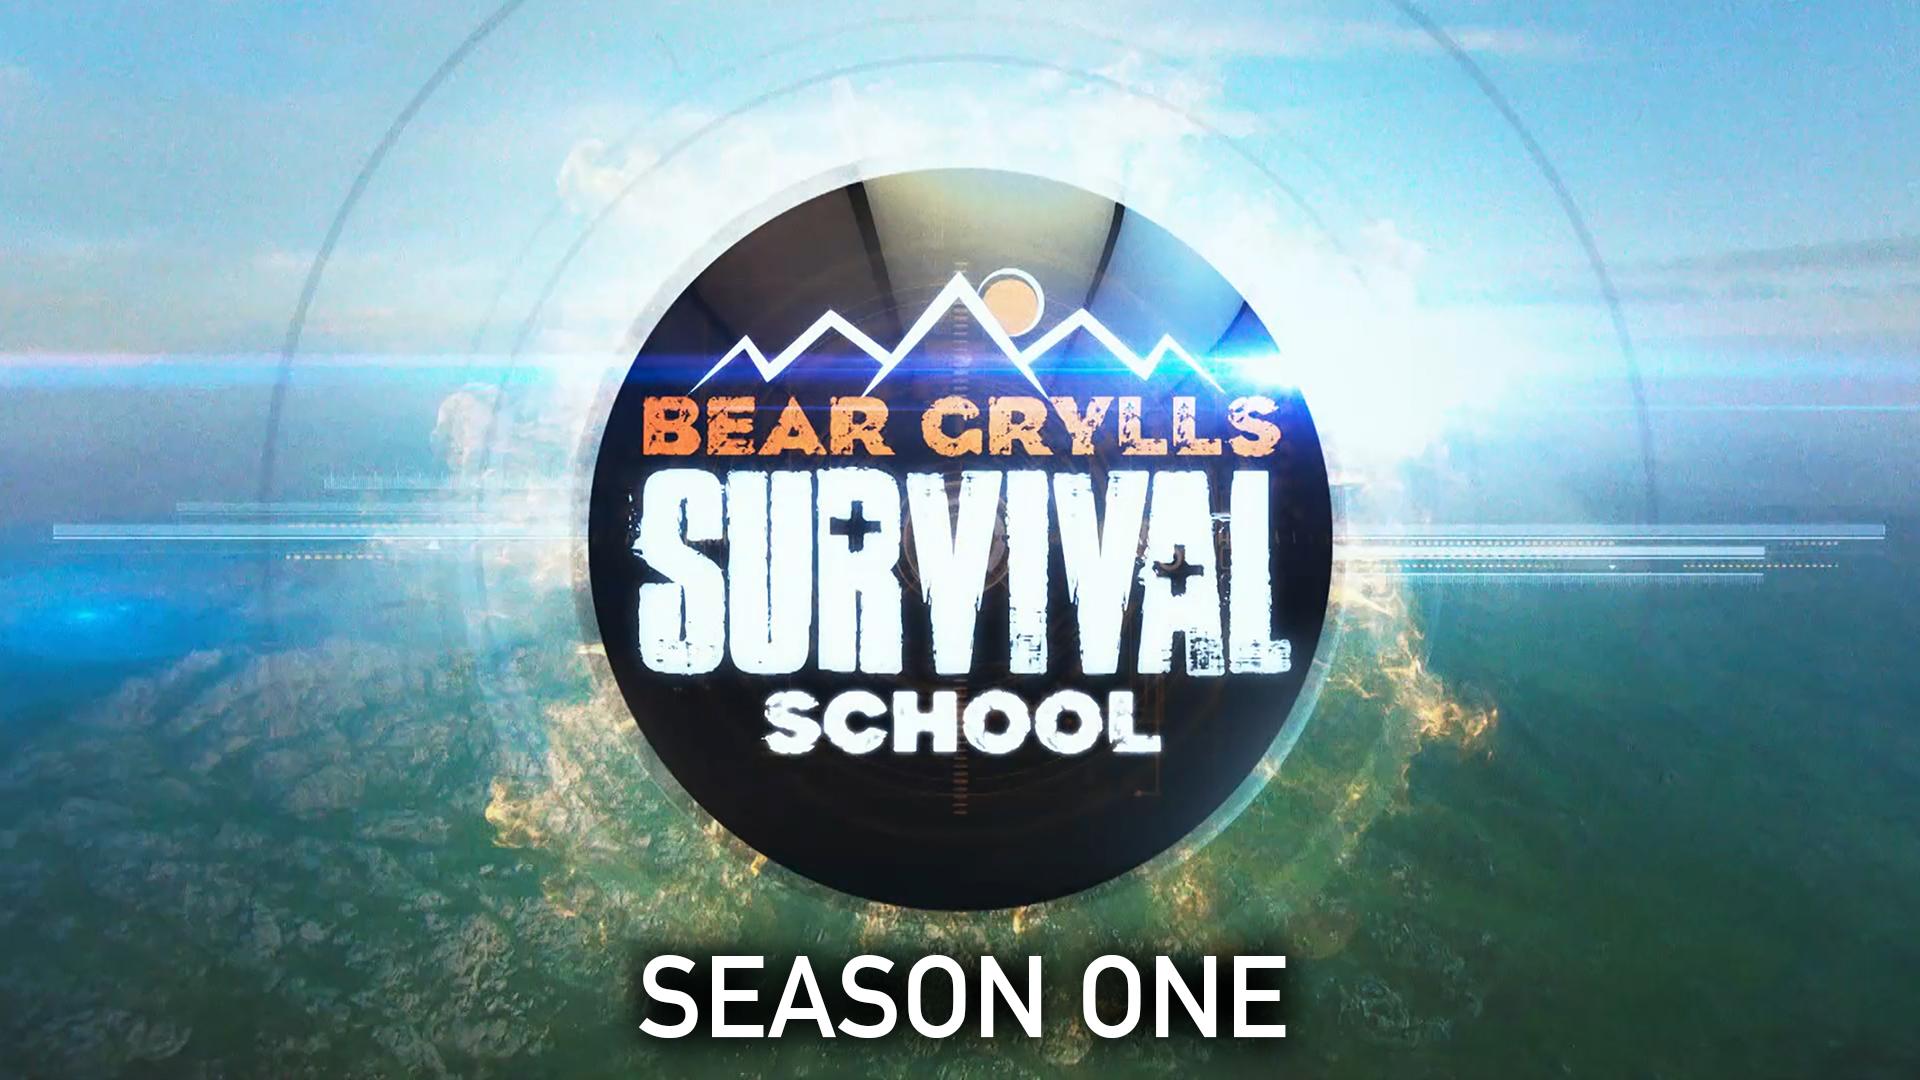 Bear Grylls: Survival School